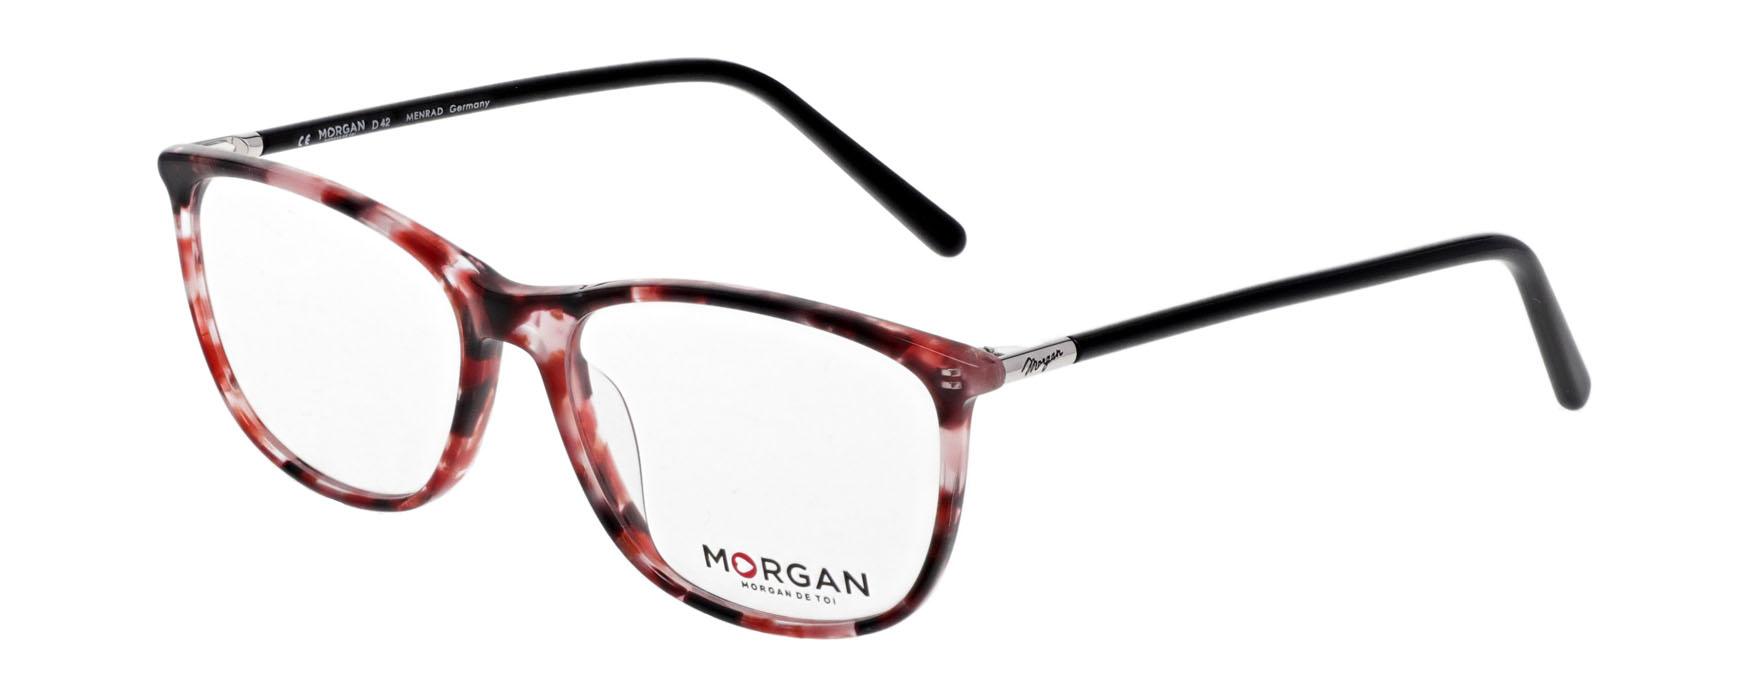 Morgan 202025 4805